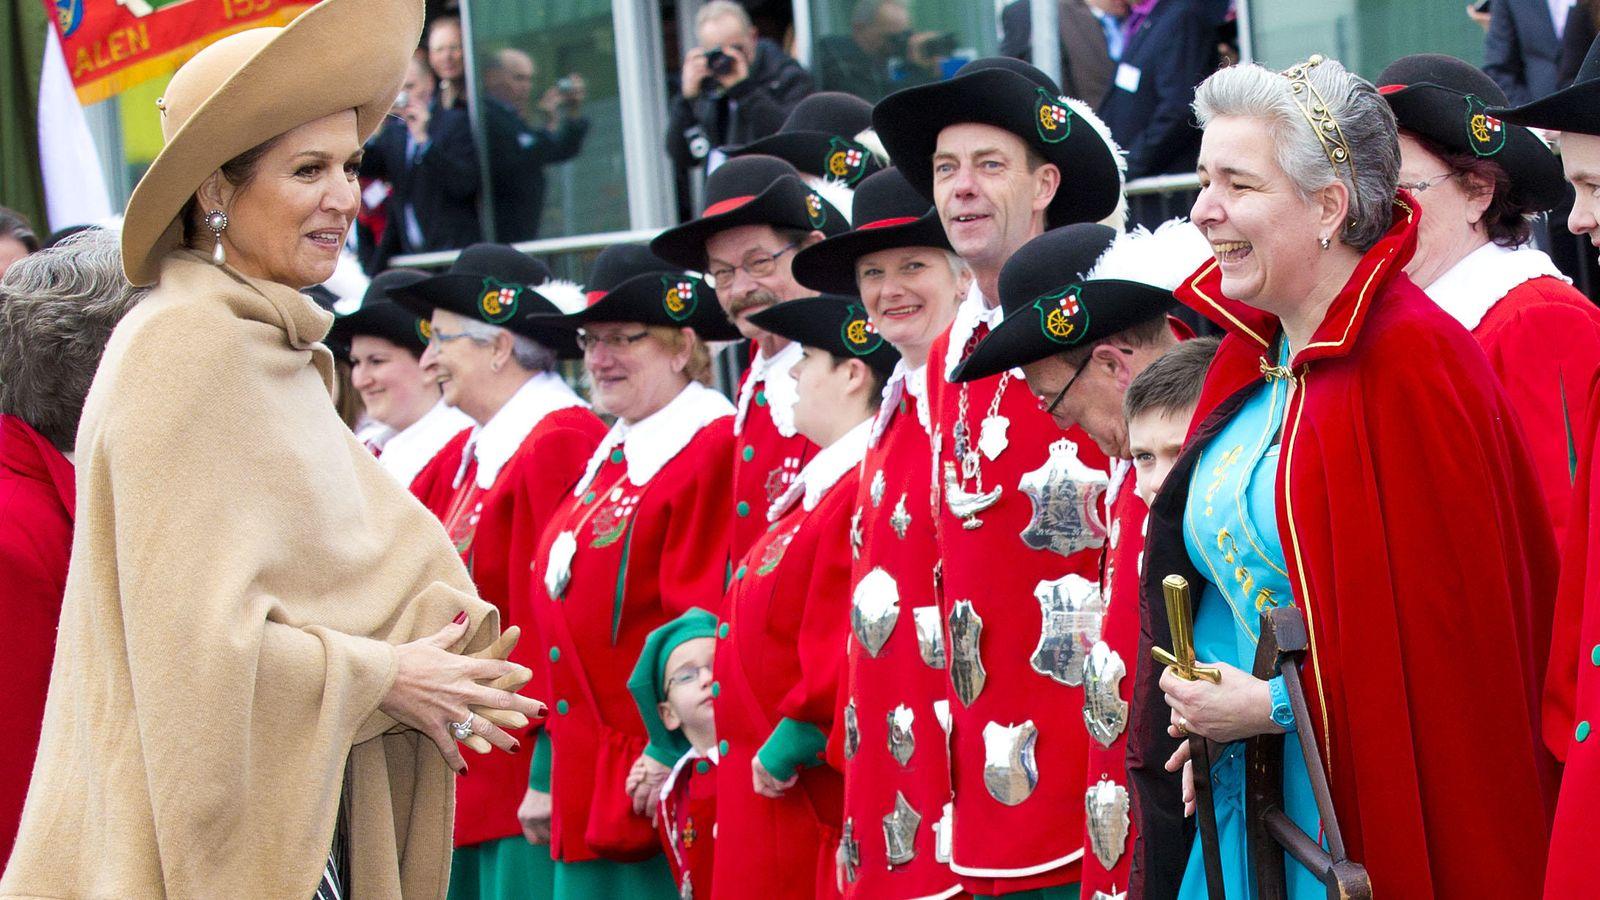 Reina Máxima de Holanda: fotos por 50 años | RSVPOnline